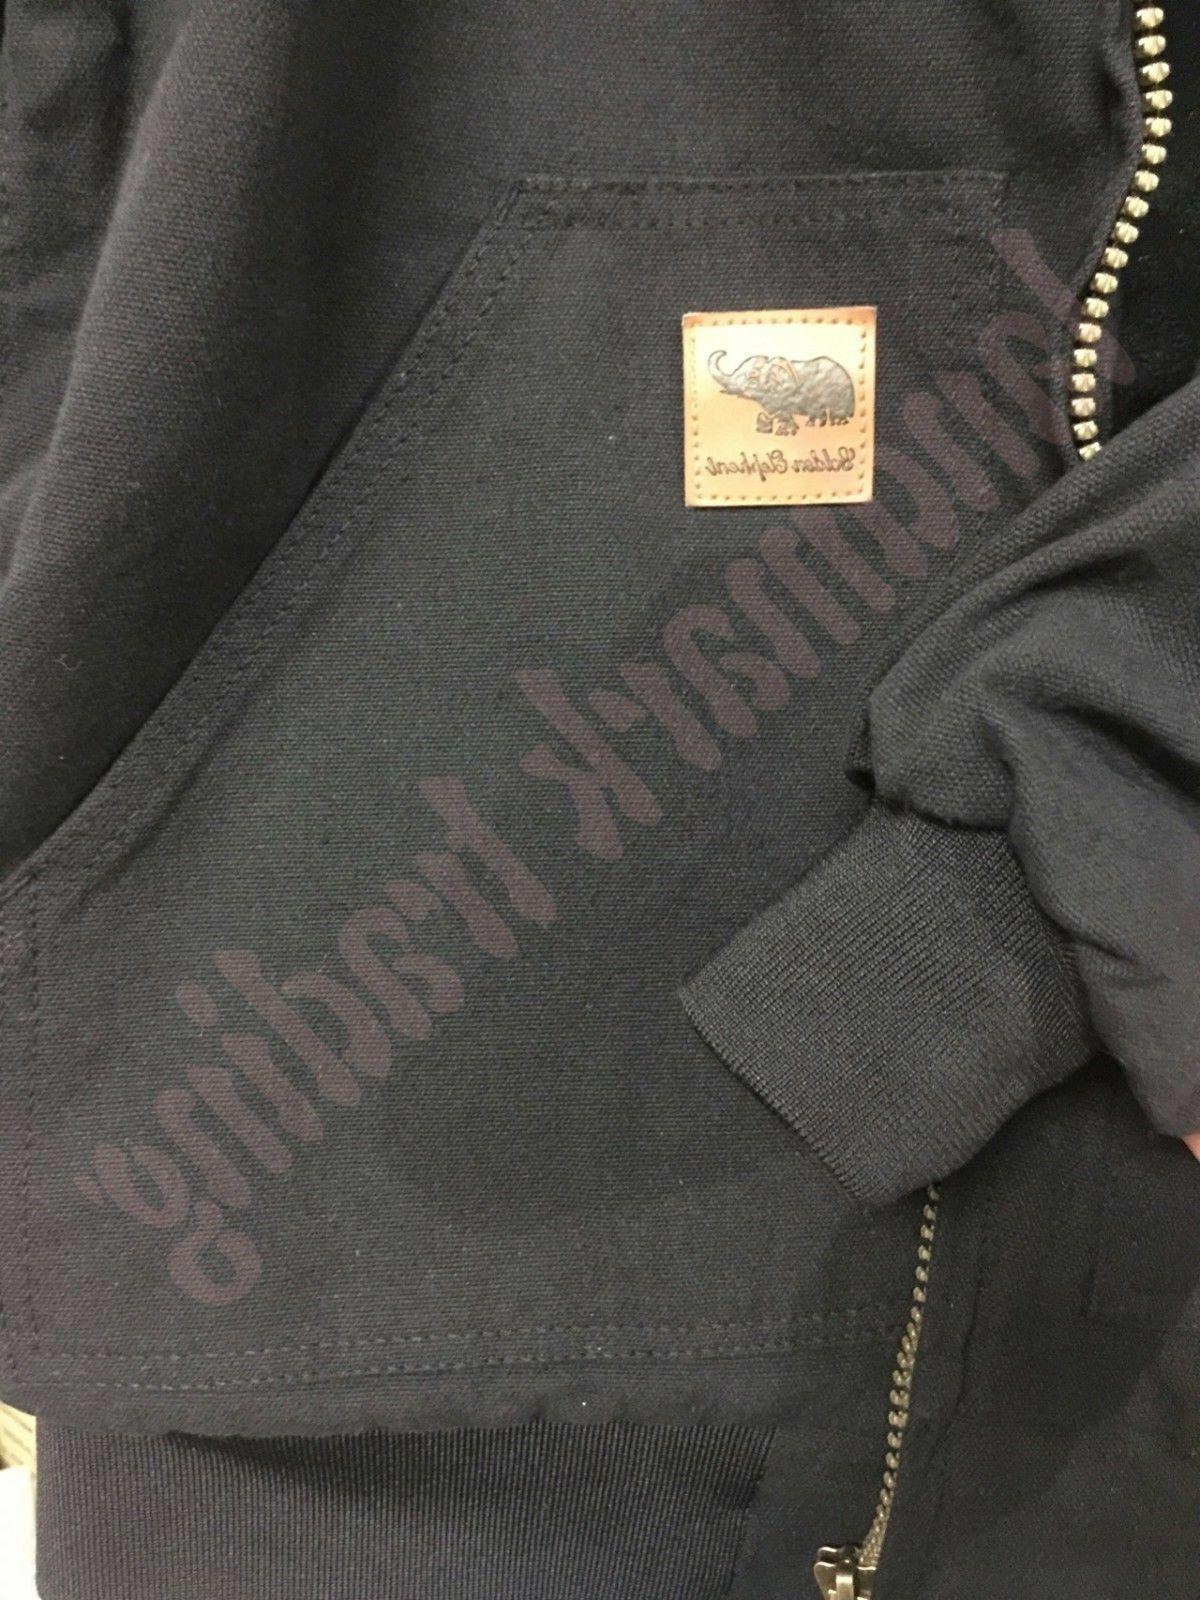 L&M Men's Jacket Coat Quilted Industrial